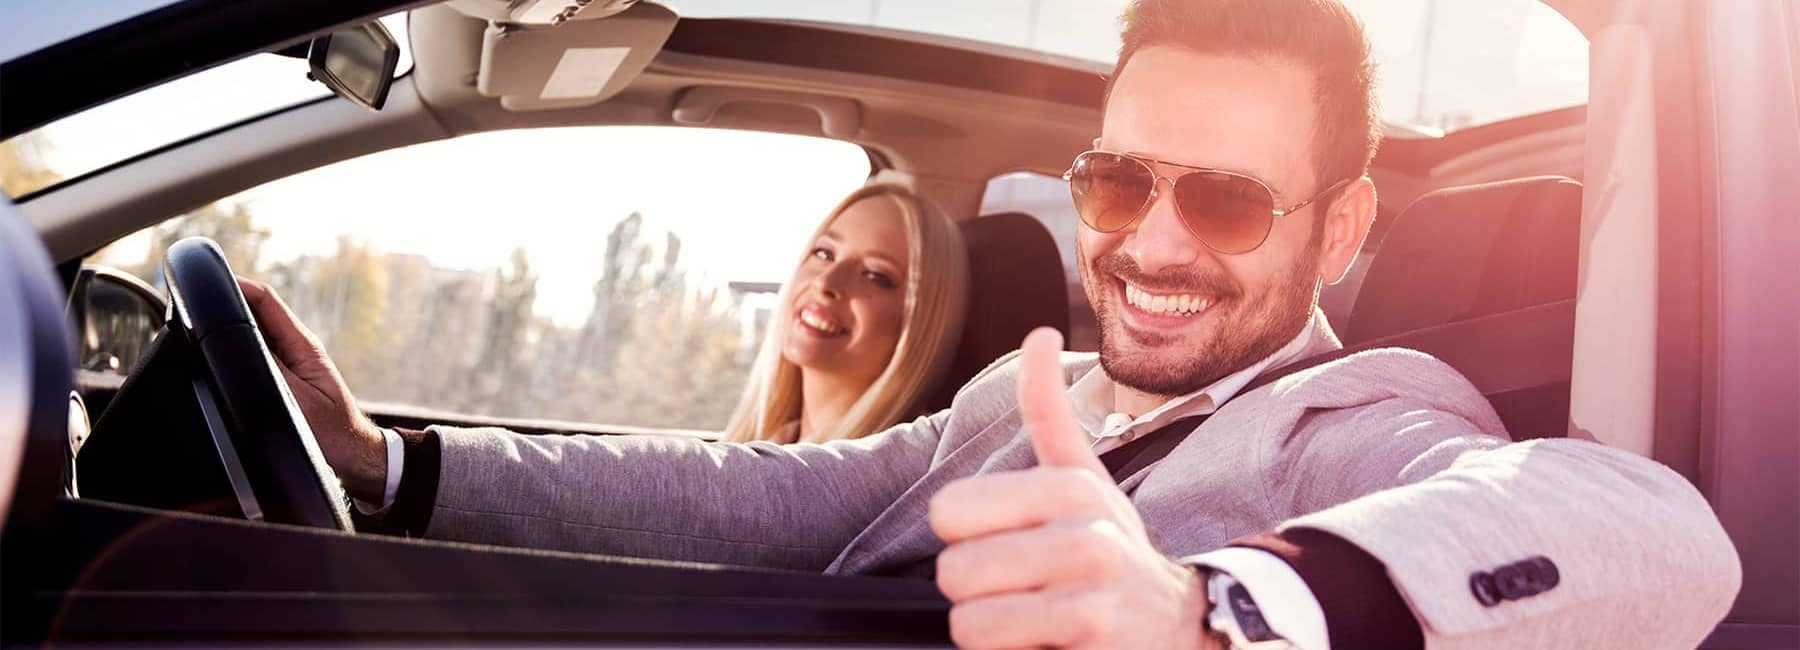 Man Driving Car Giving Thumbs Up